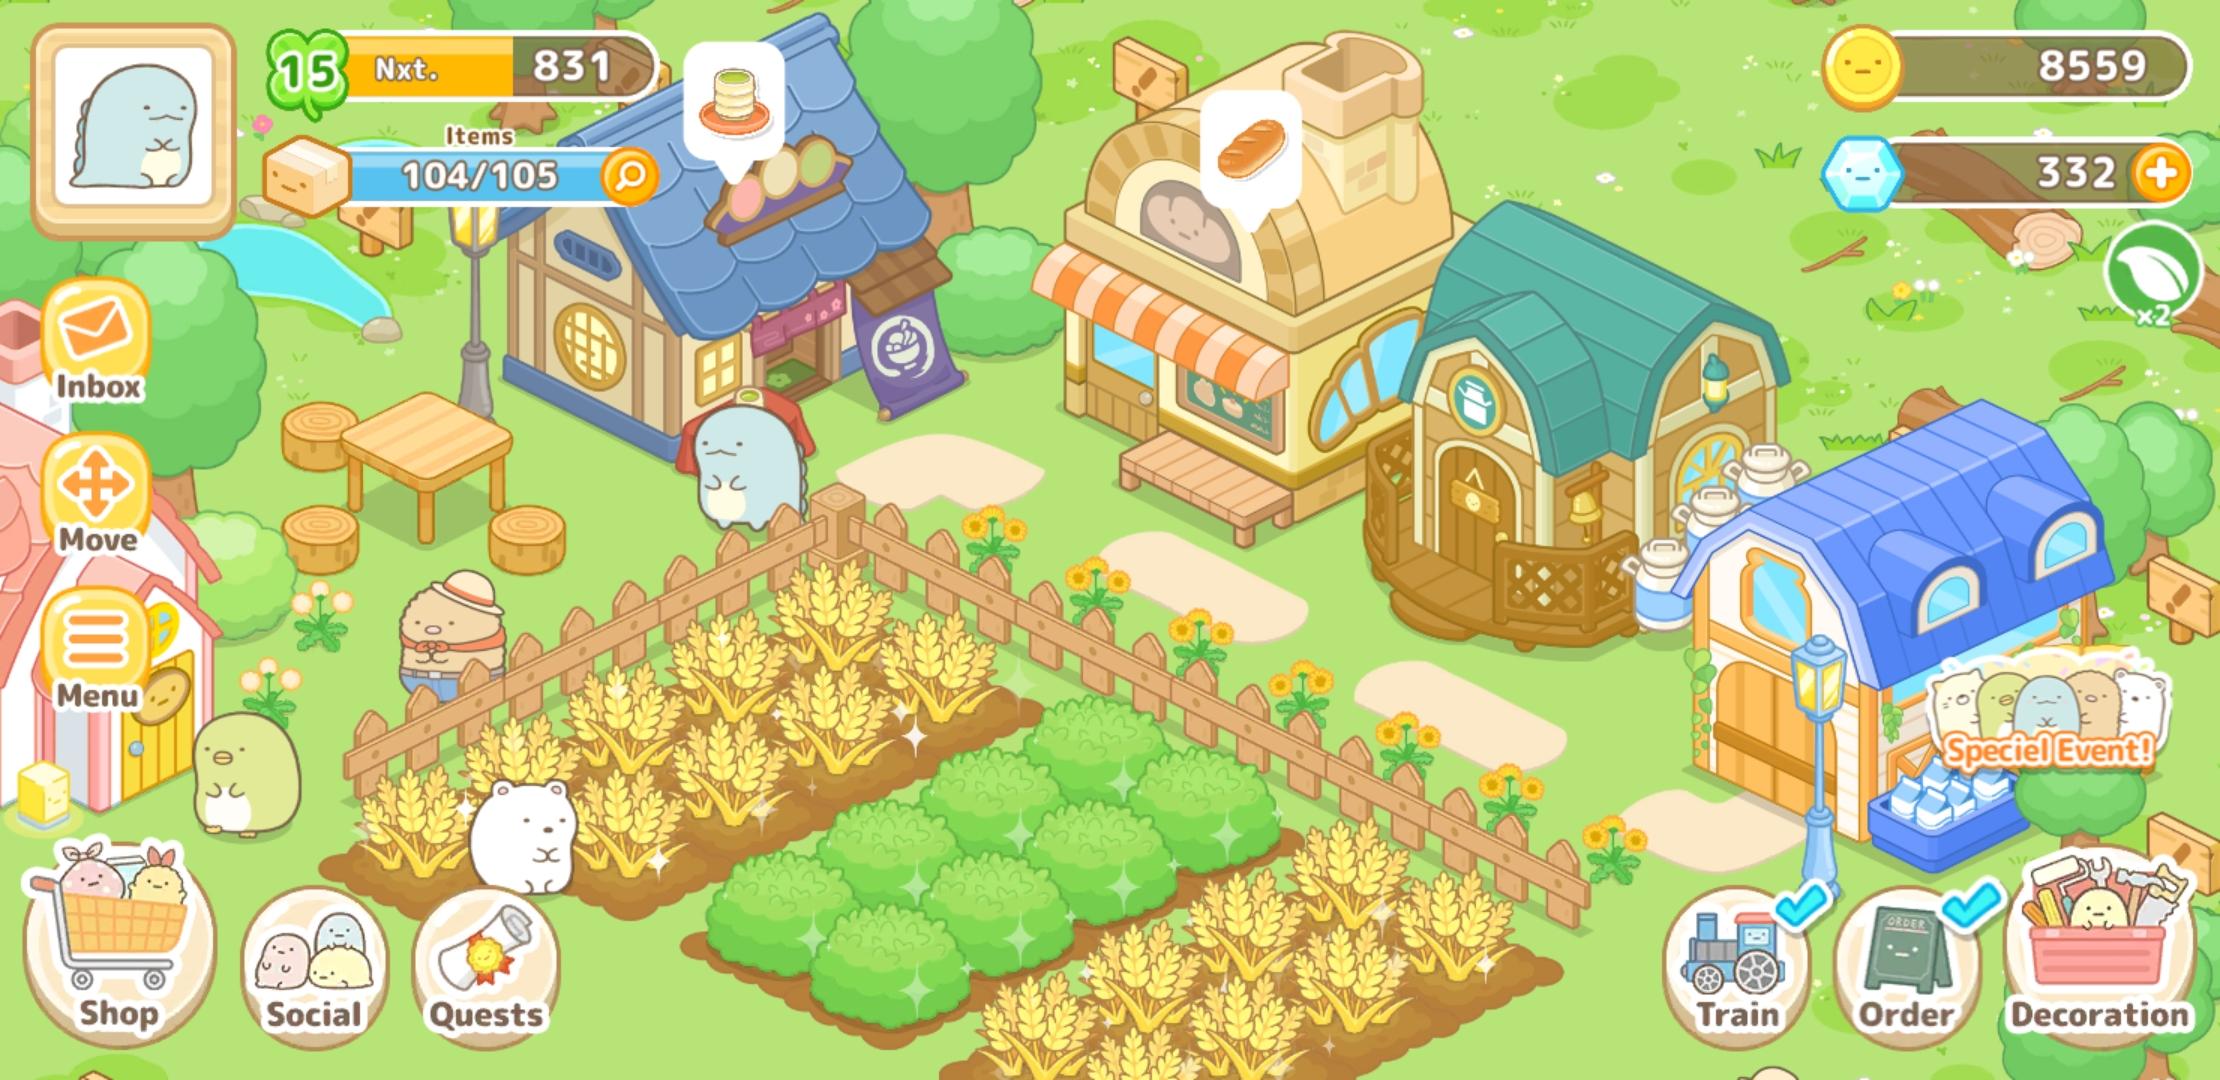 Sumikkogurashi Farm Review – An Adorable & Relaxing Farm Simulation Game